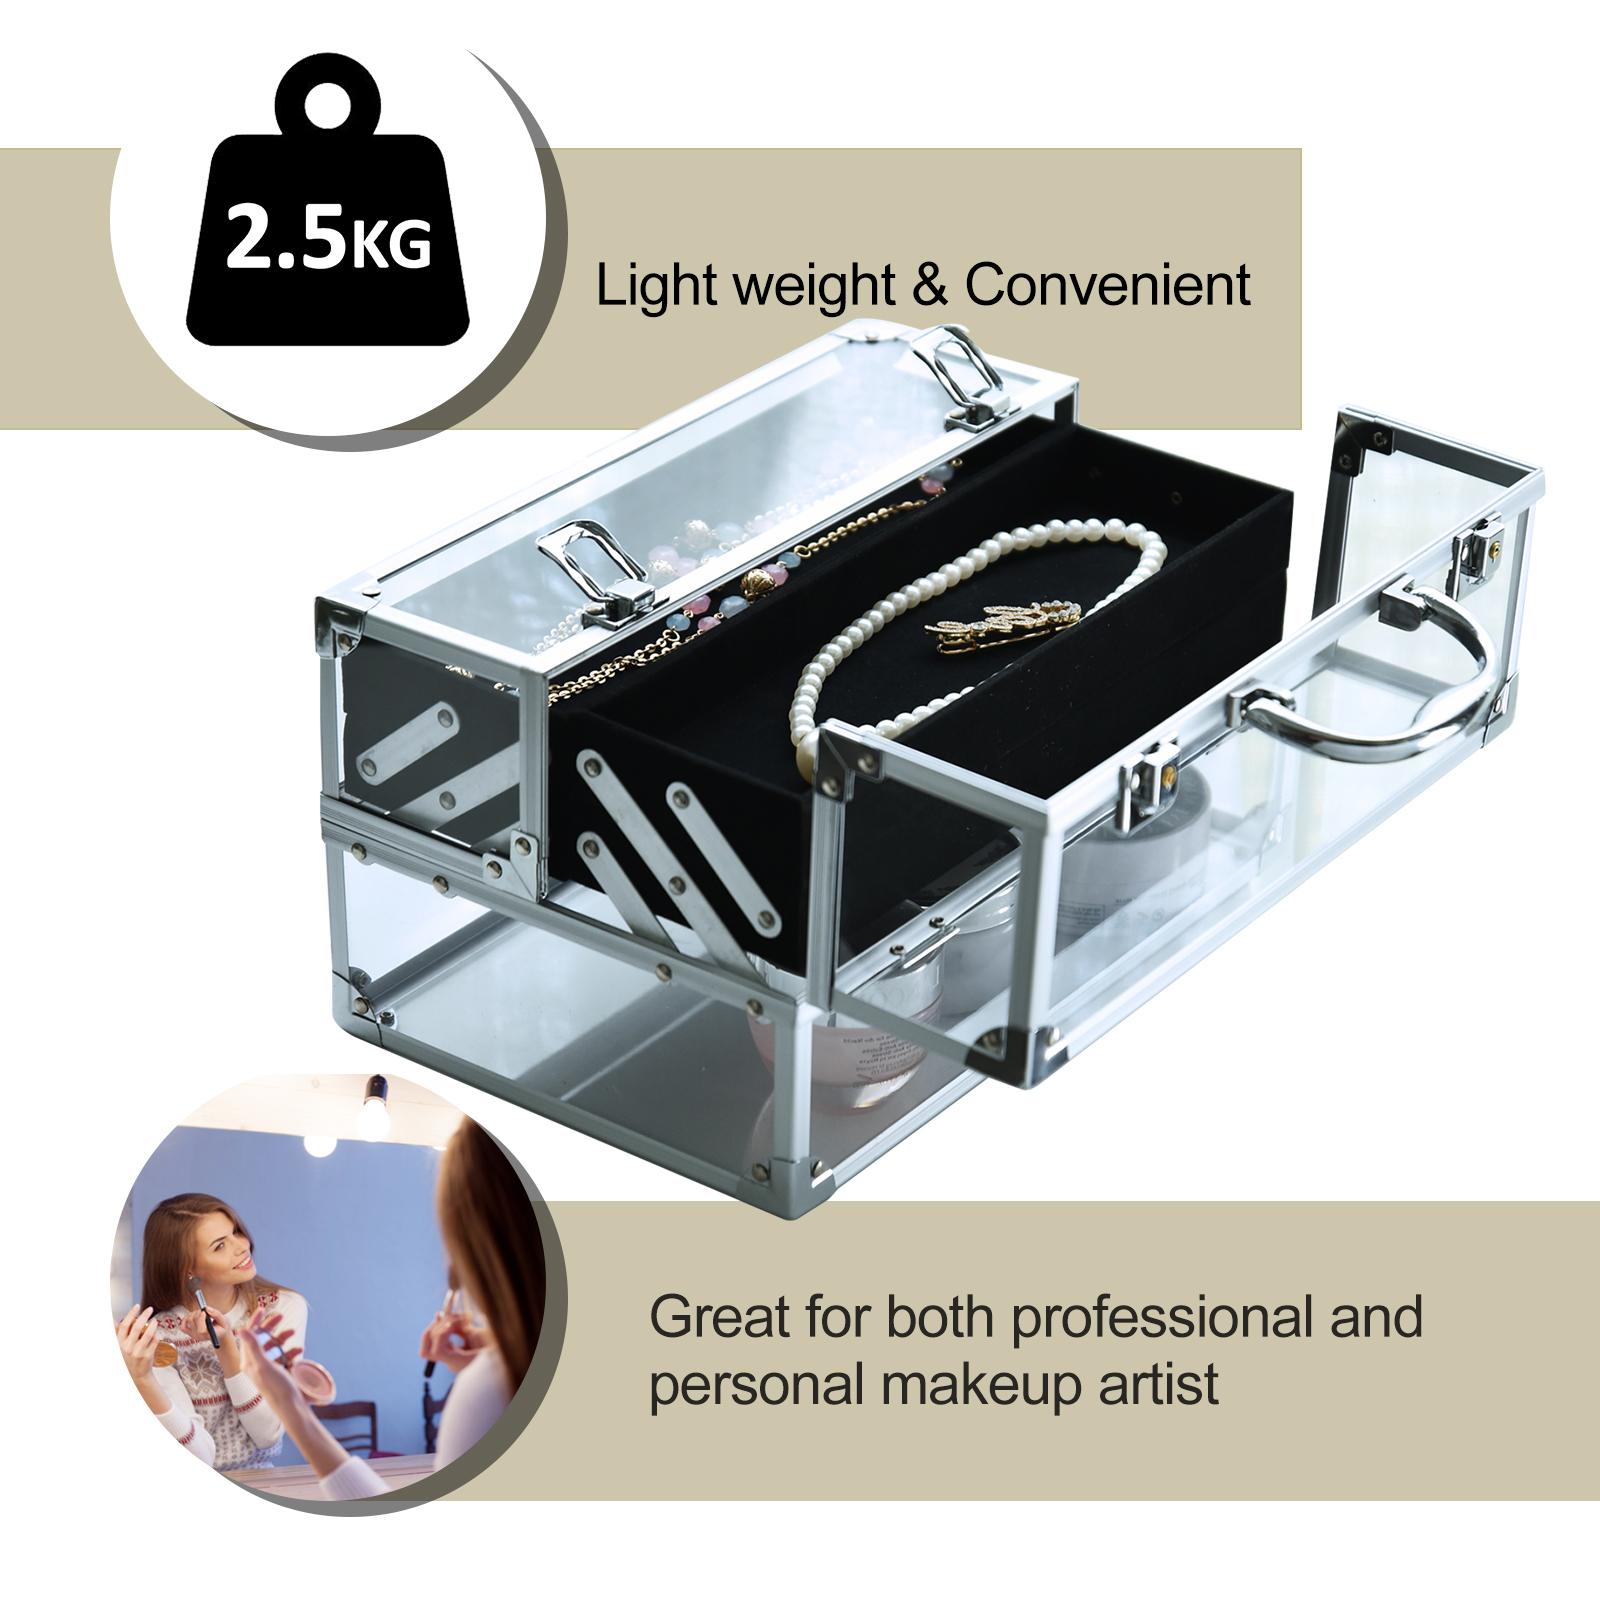 Portable-Makeup-Case-Train-Case-Lockable-Aluminum-with-4-Trays thumbnail 21